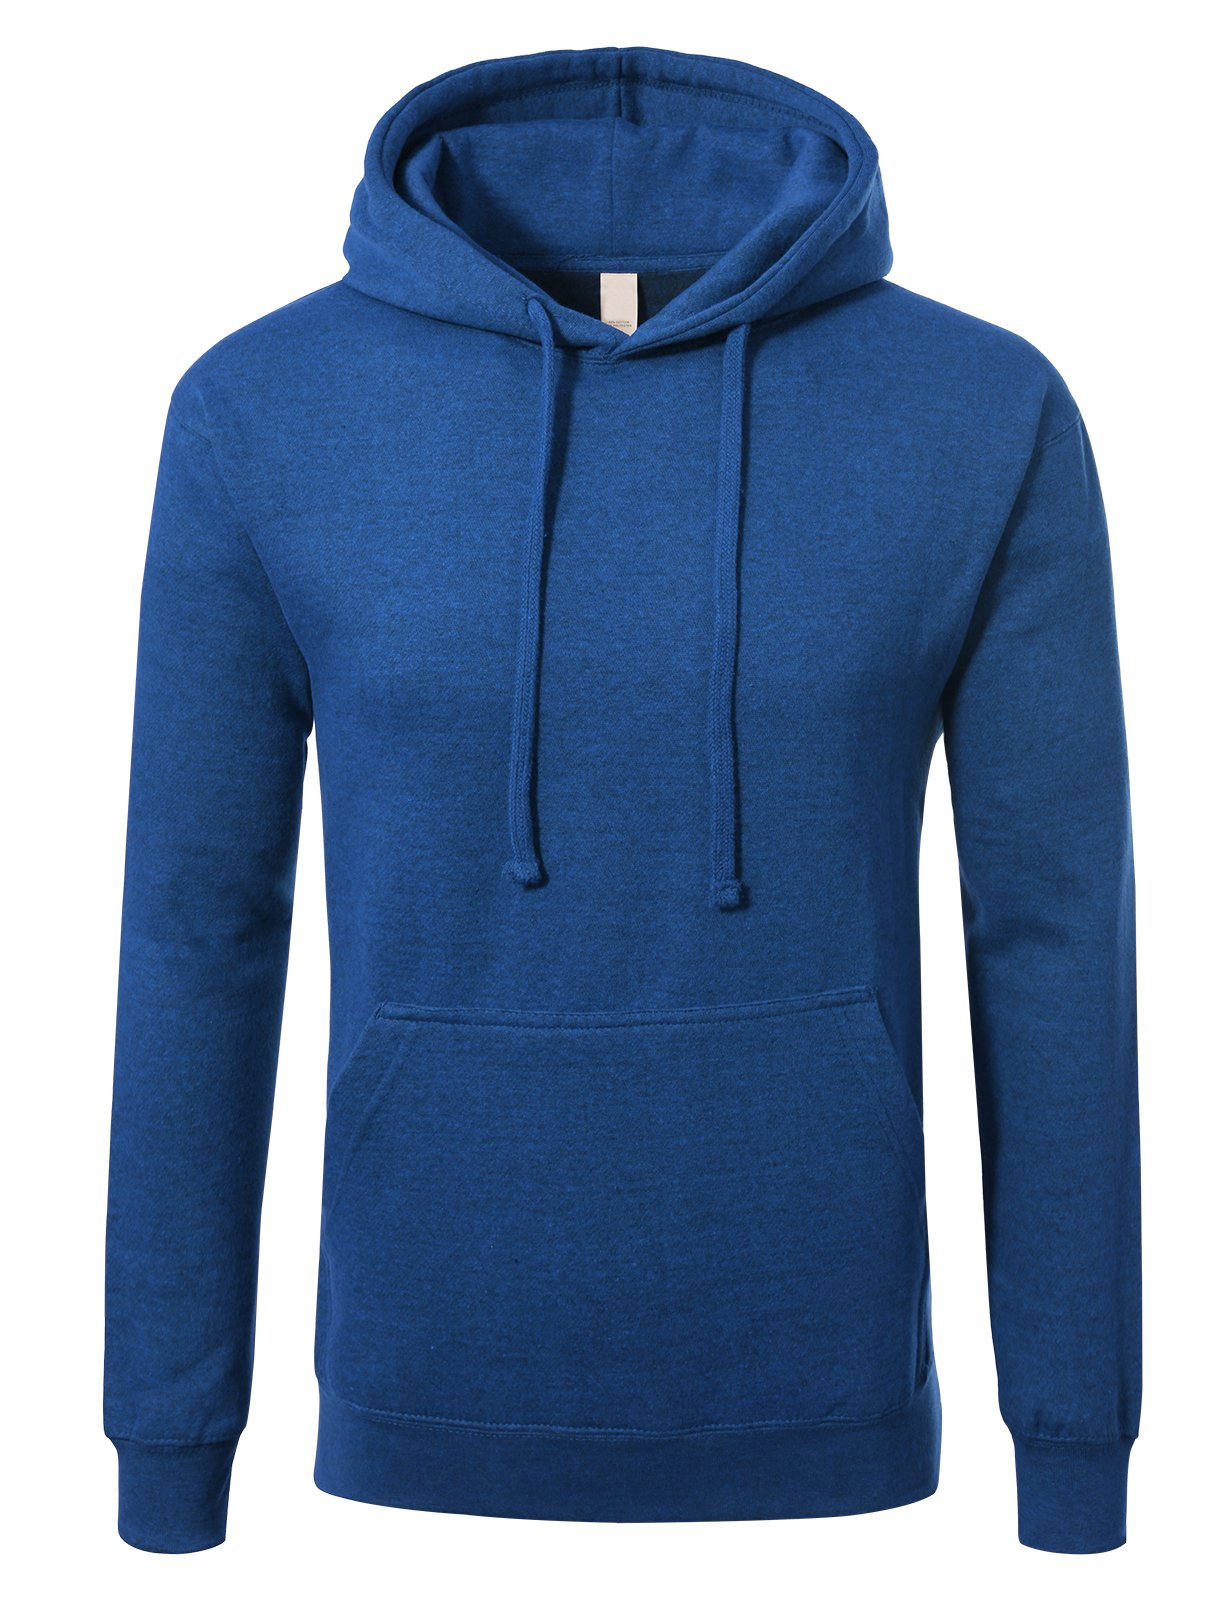 JD Apparel Men's Premium Heavyweight Pullover